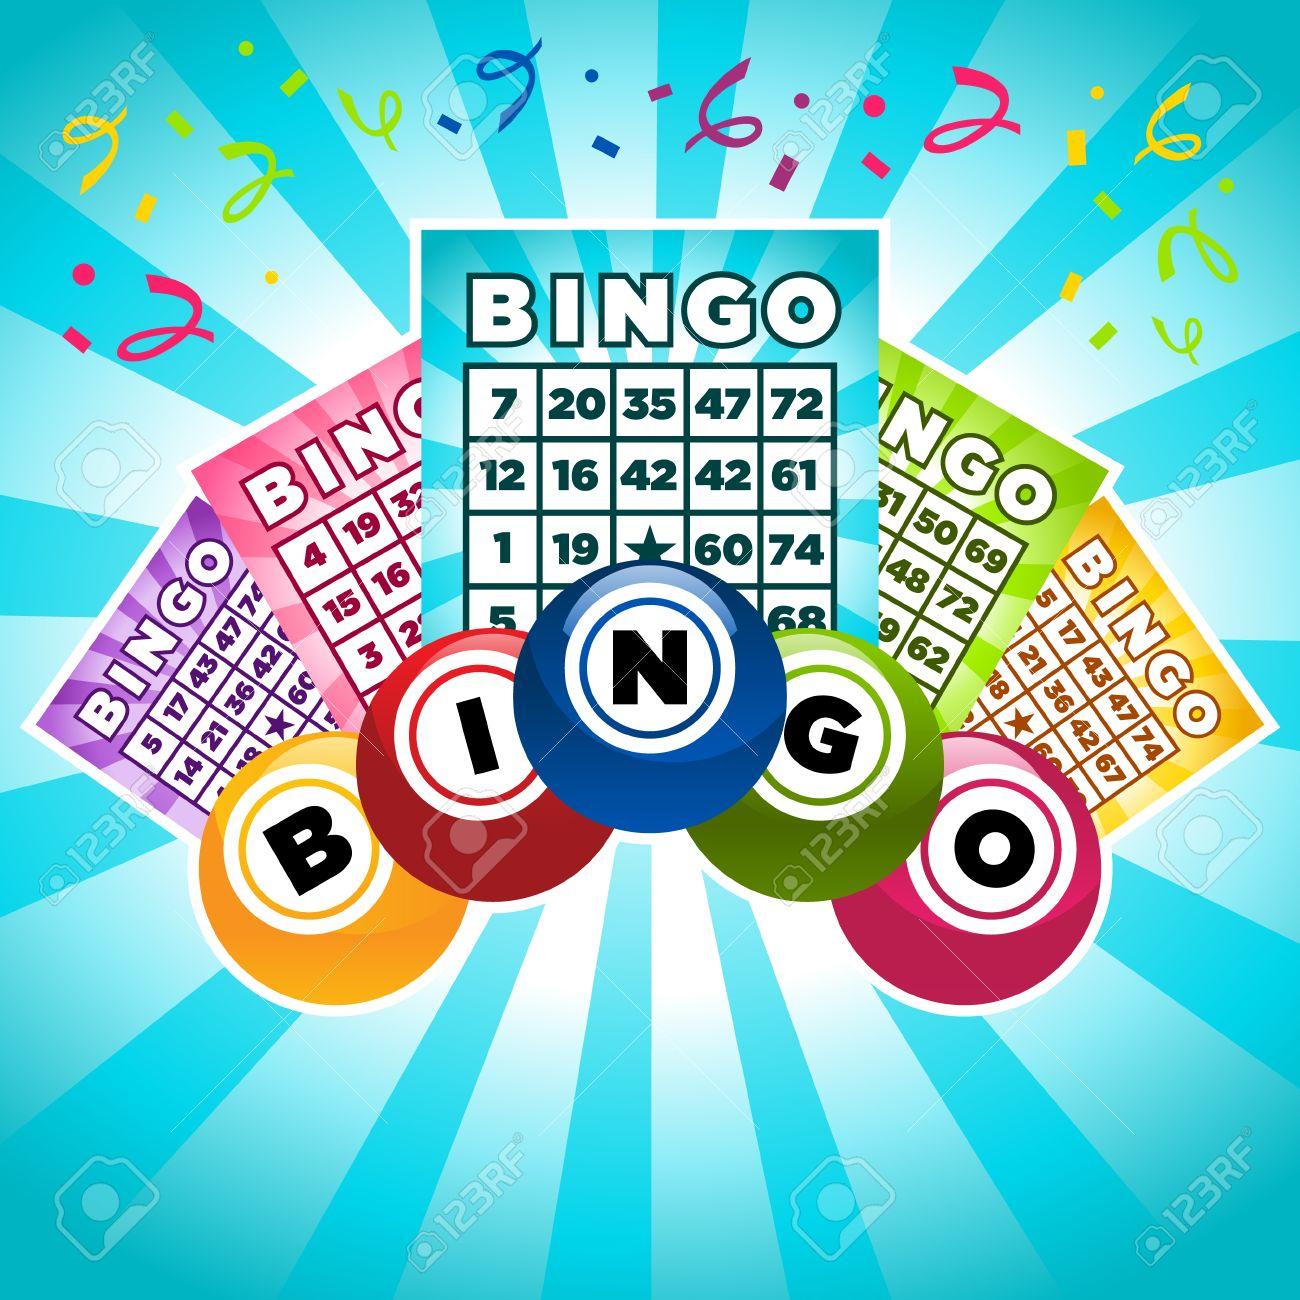 1,578 Bingo Balls Stock Vector Illustration And Royalty Free Bingo ...